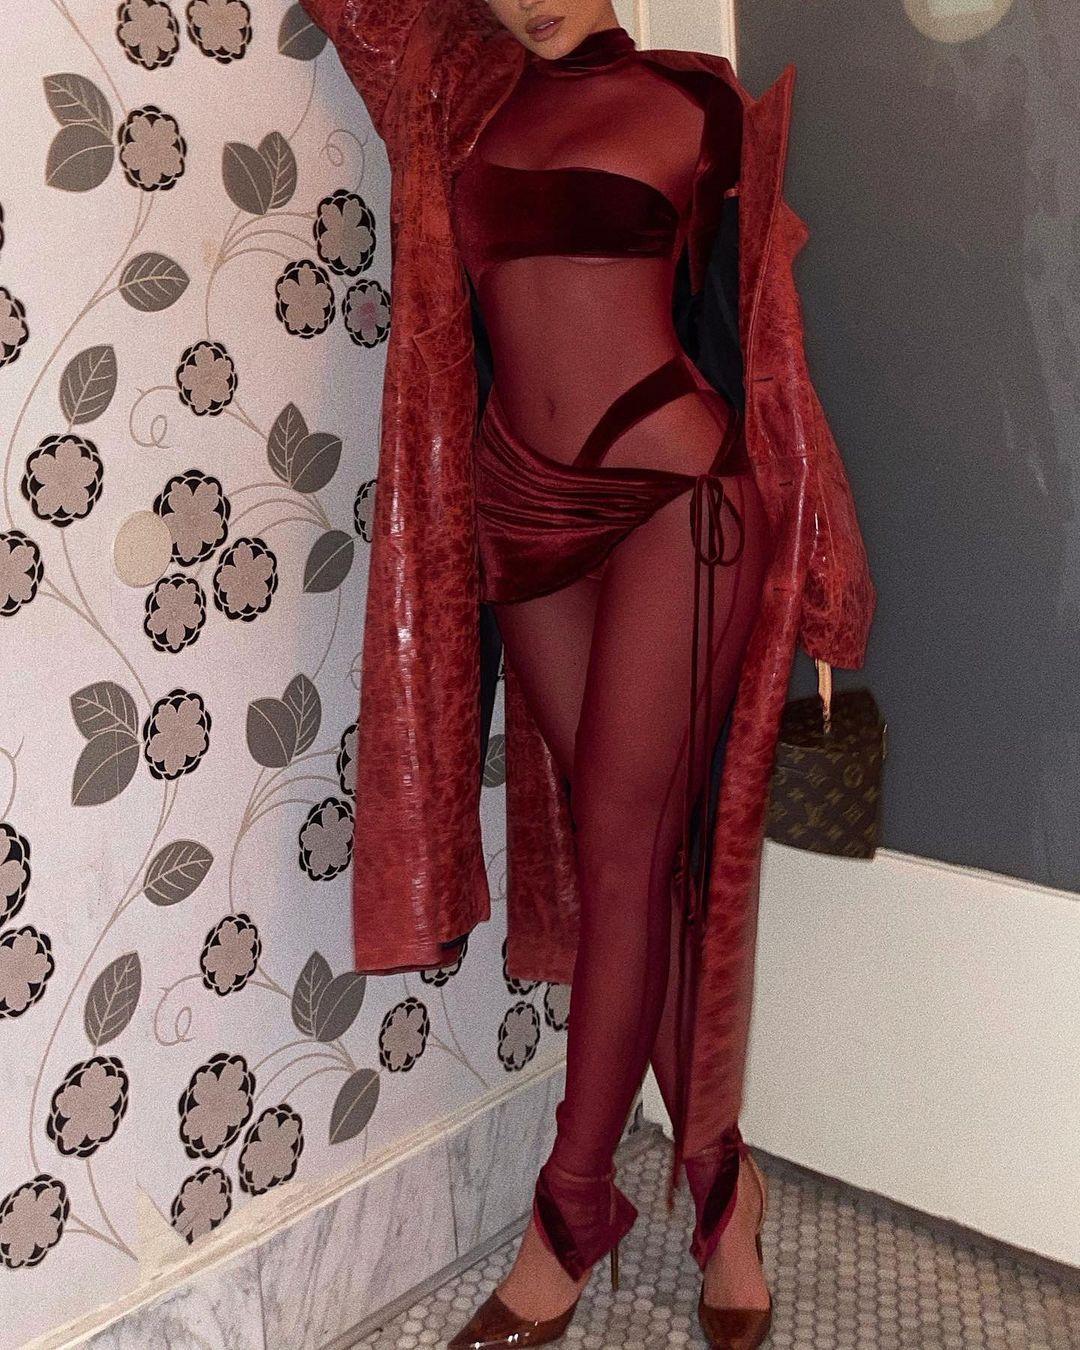 Kylie Jenner Skimpy Outfit